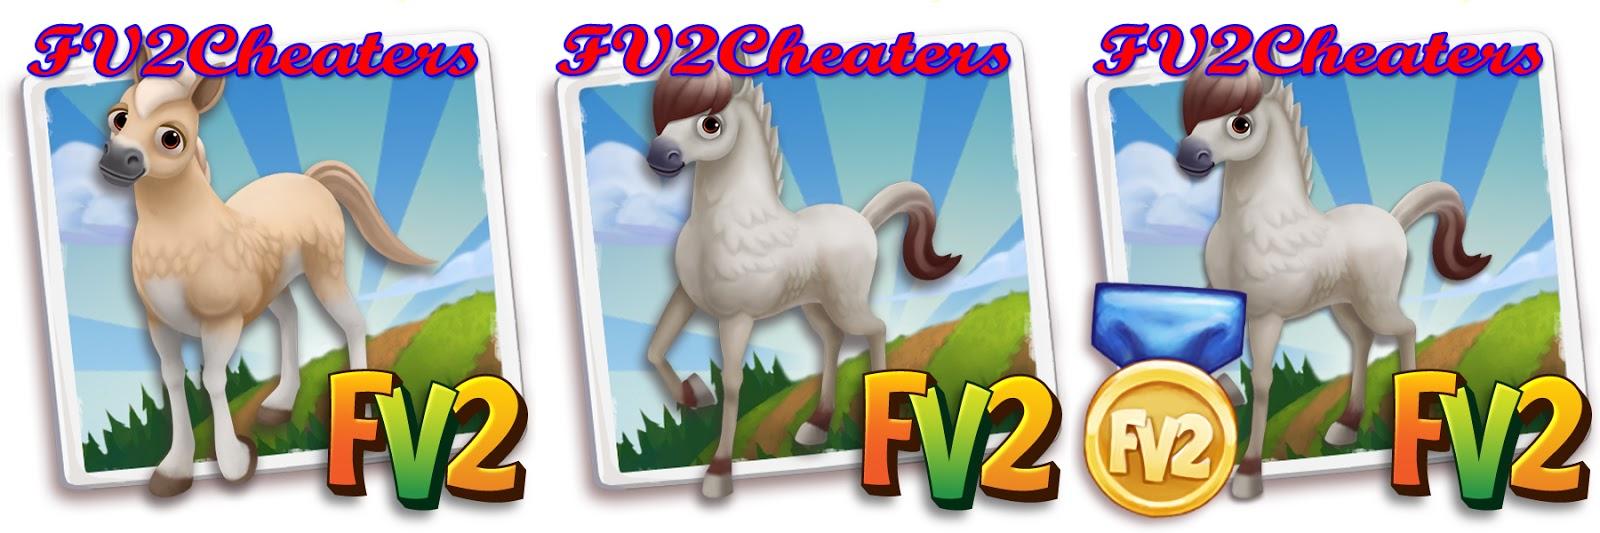 Marvelous Farmville Horse #6: Farmville 2 Cheat Code For White Fjord Horse